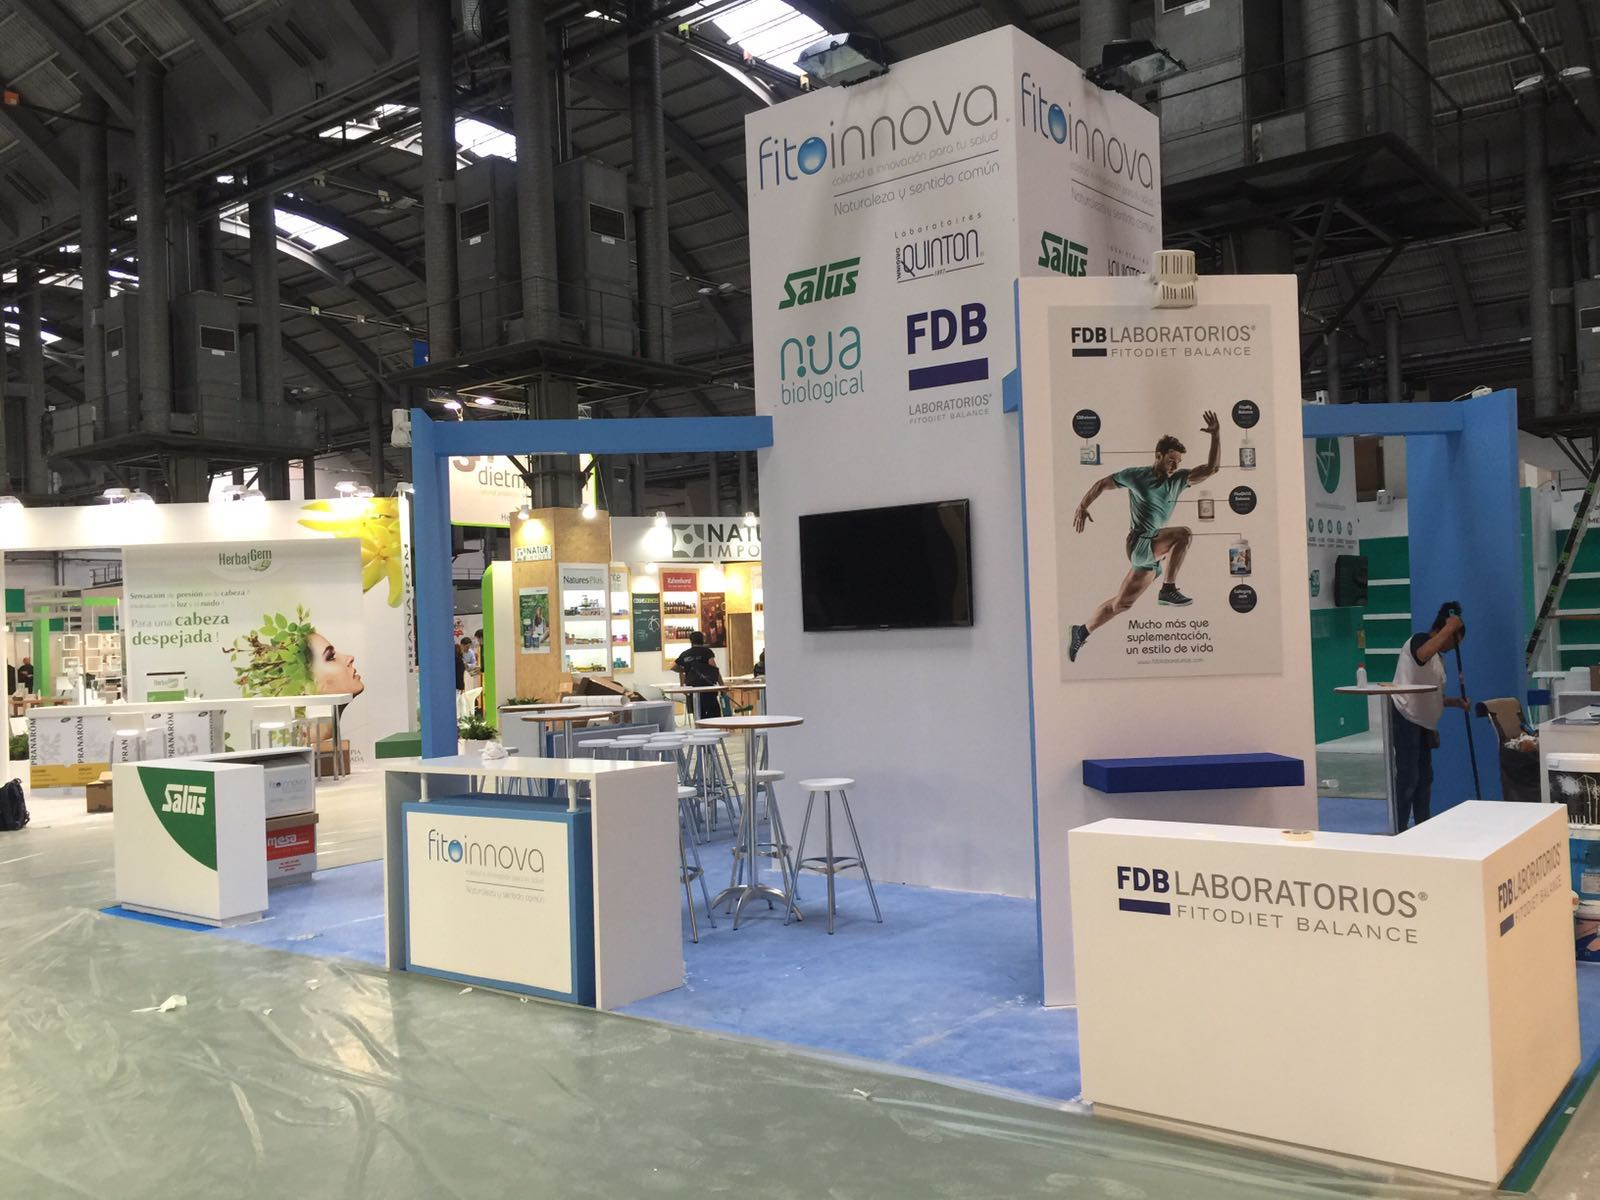 Feria expo eco salud en barcelona montju c nivel 2 stands j p carpinteros - Carpintero en barcelona ...